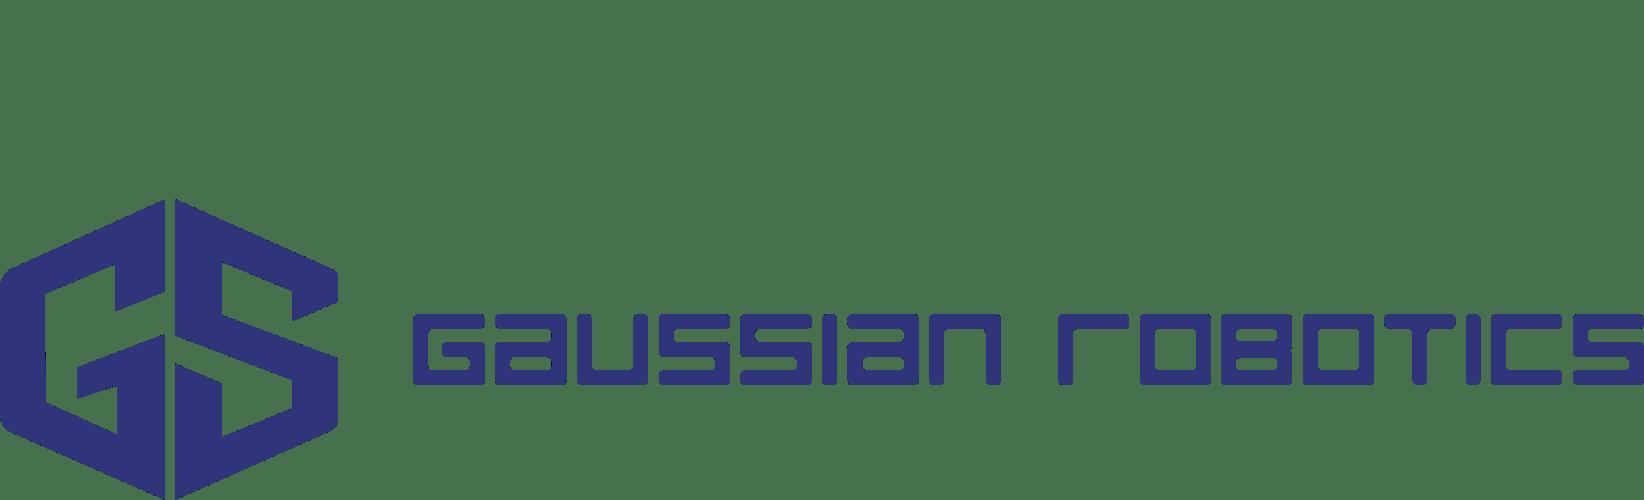 Gaussian Robotics company logo